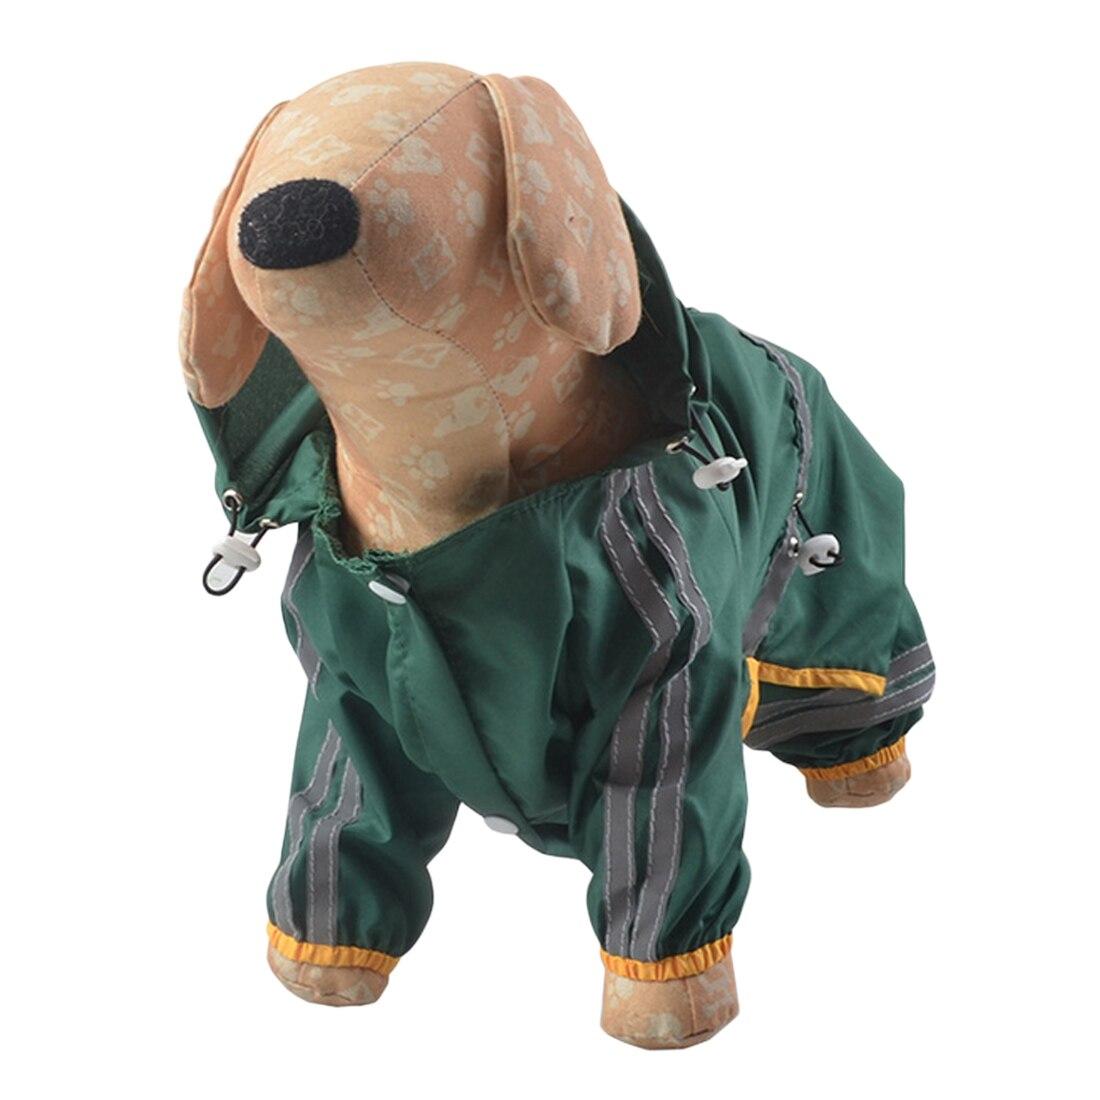 Puppy Pet Dog Cool Raincoat Glisten Bar Waterproof Rain Lovely Jackets Coat Apparel Clothes Pet Supplies